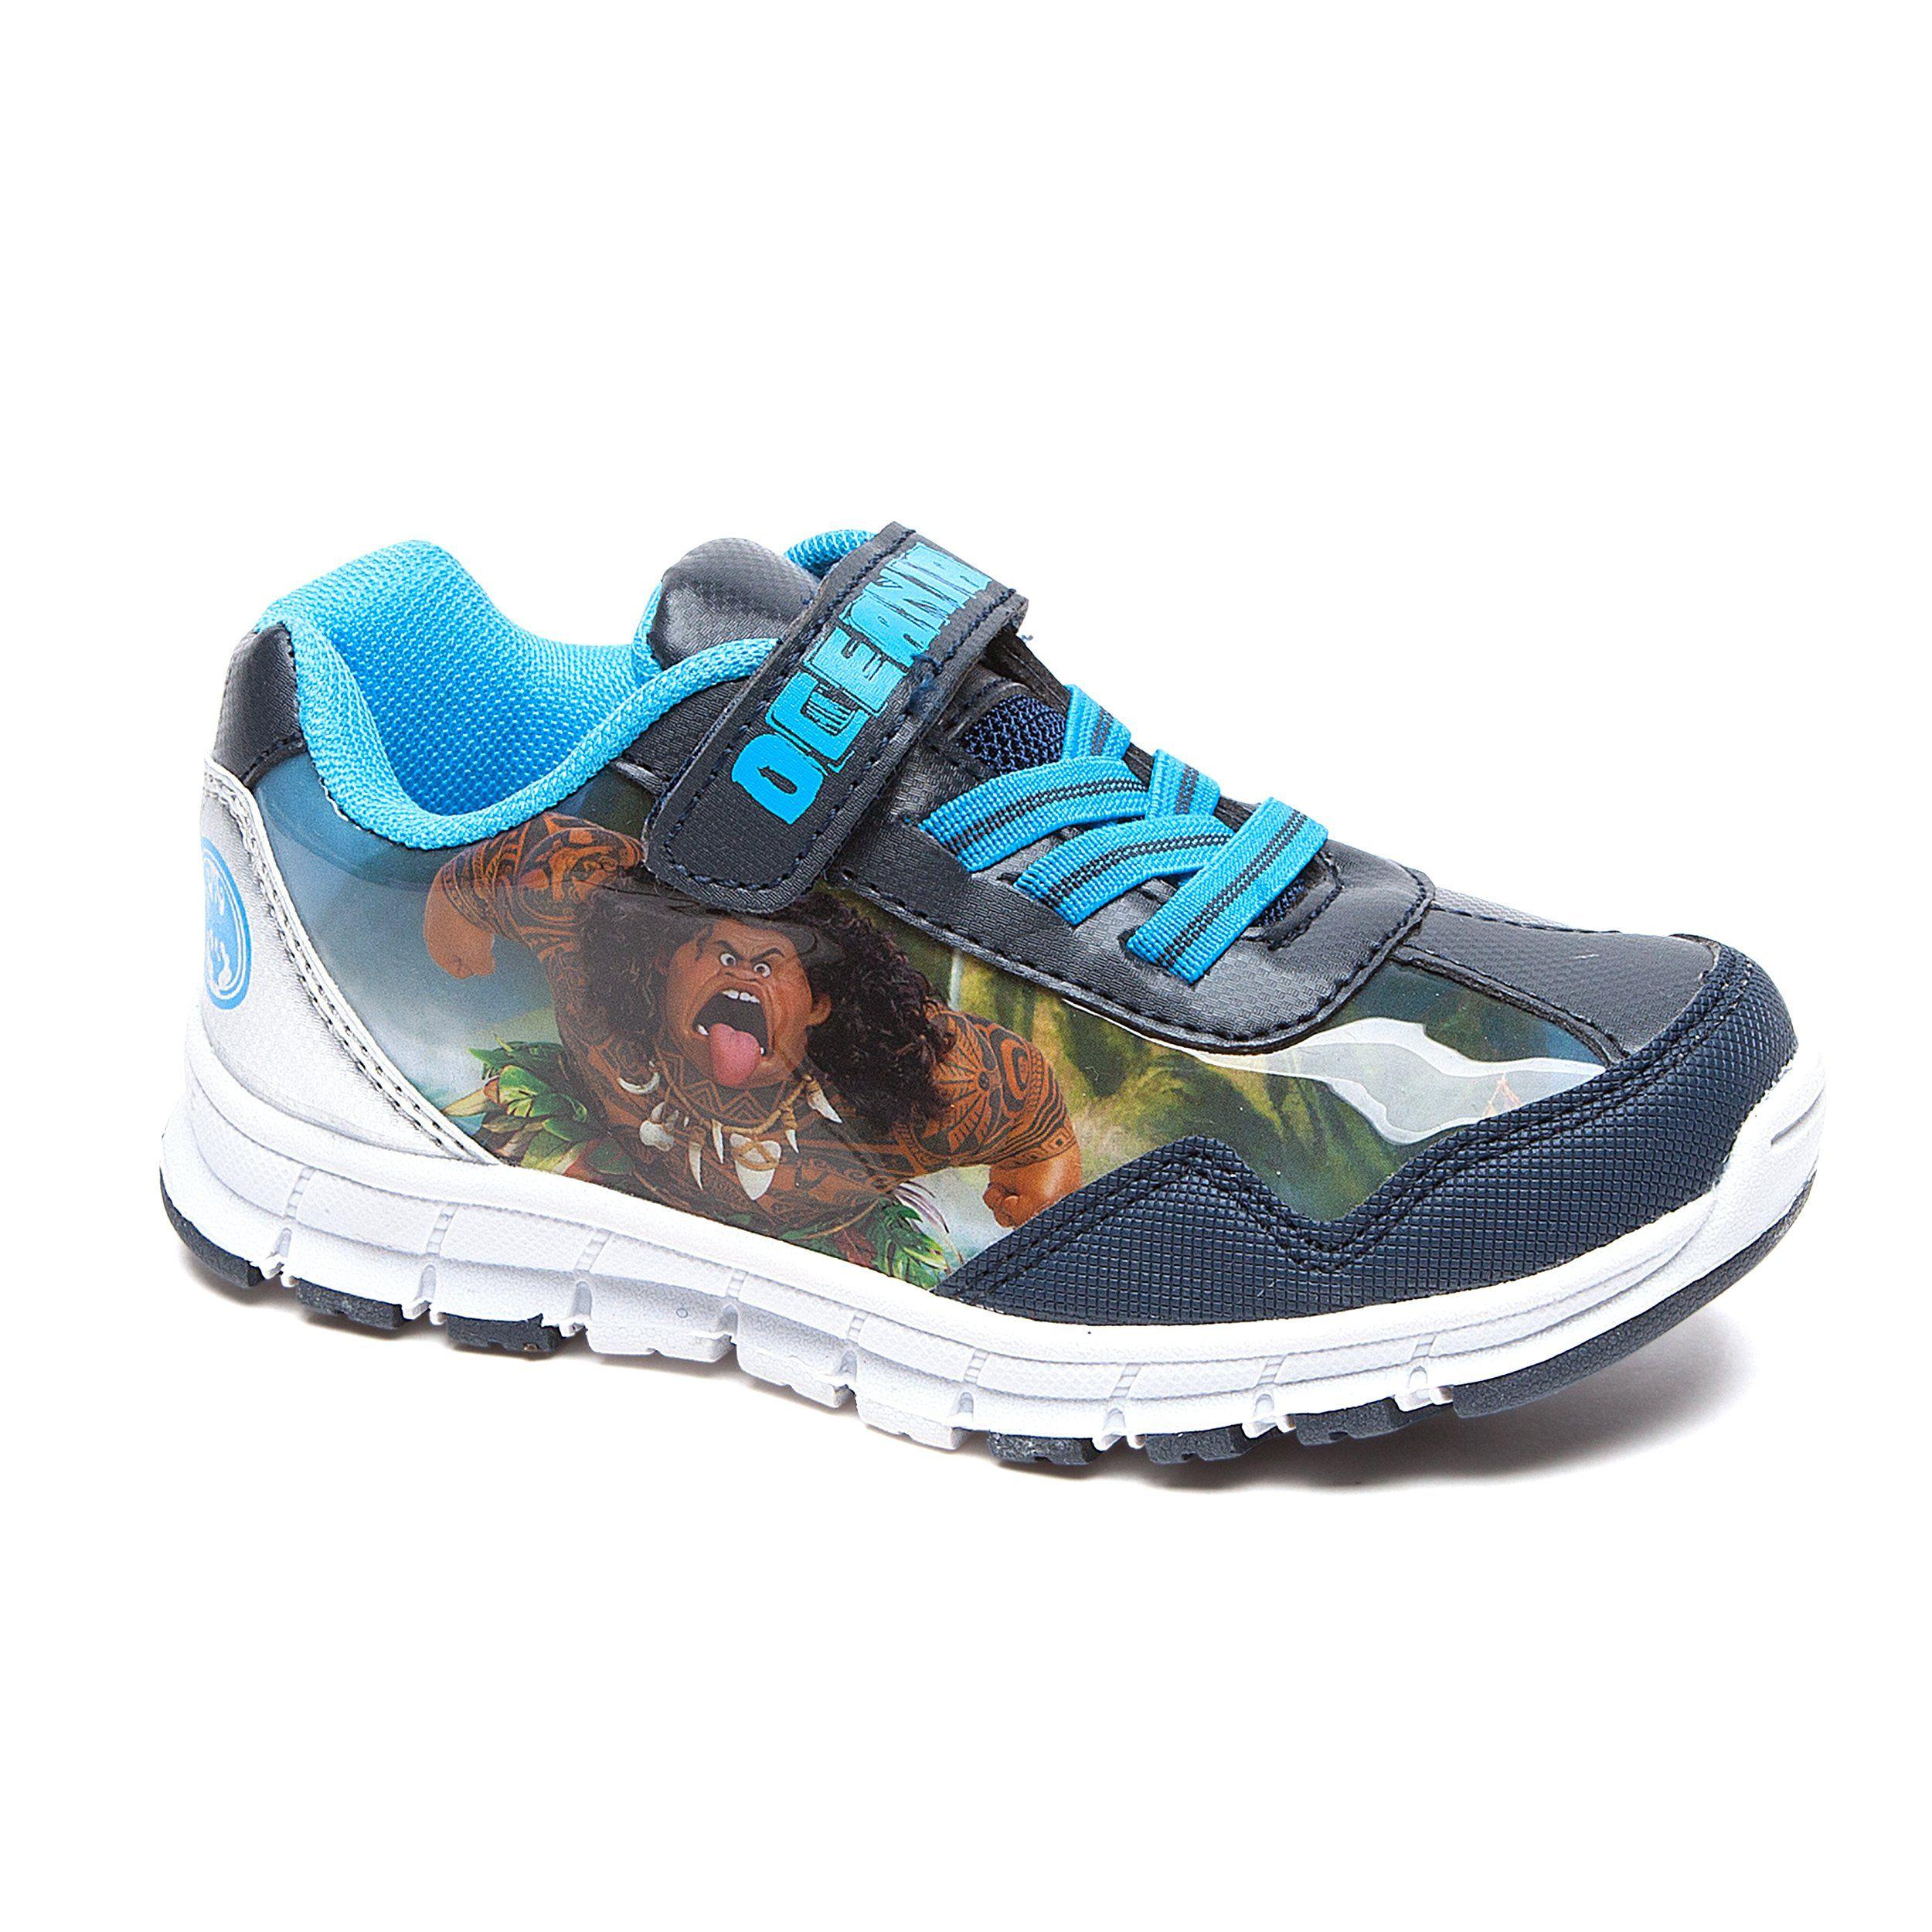 Moana High tops Moana sneakers women/'s and kid/'s shoes shoes men/'s Moana shoes